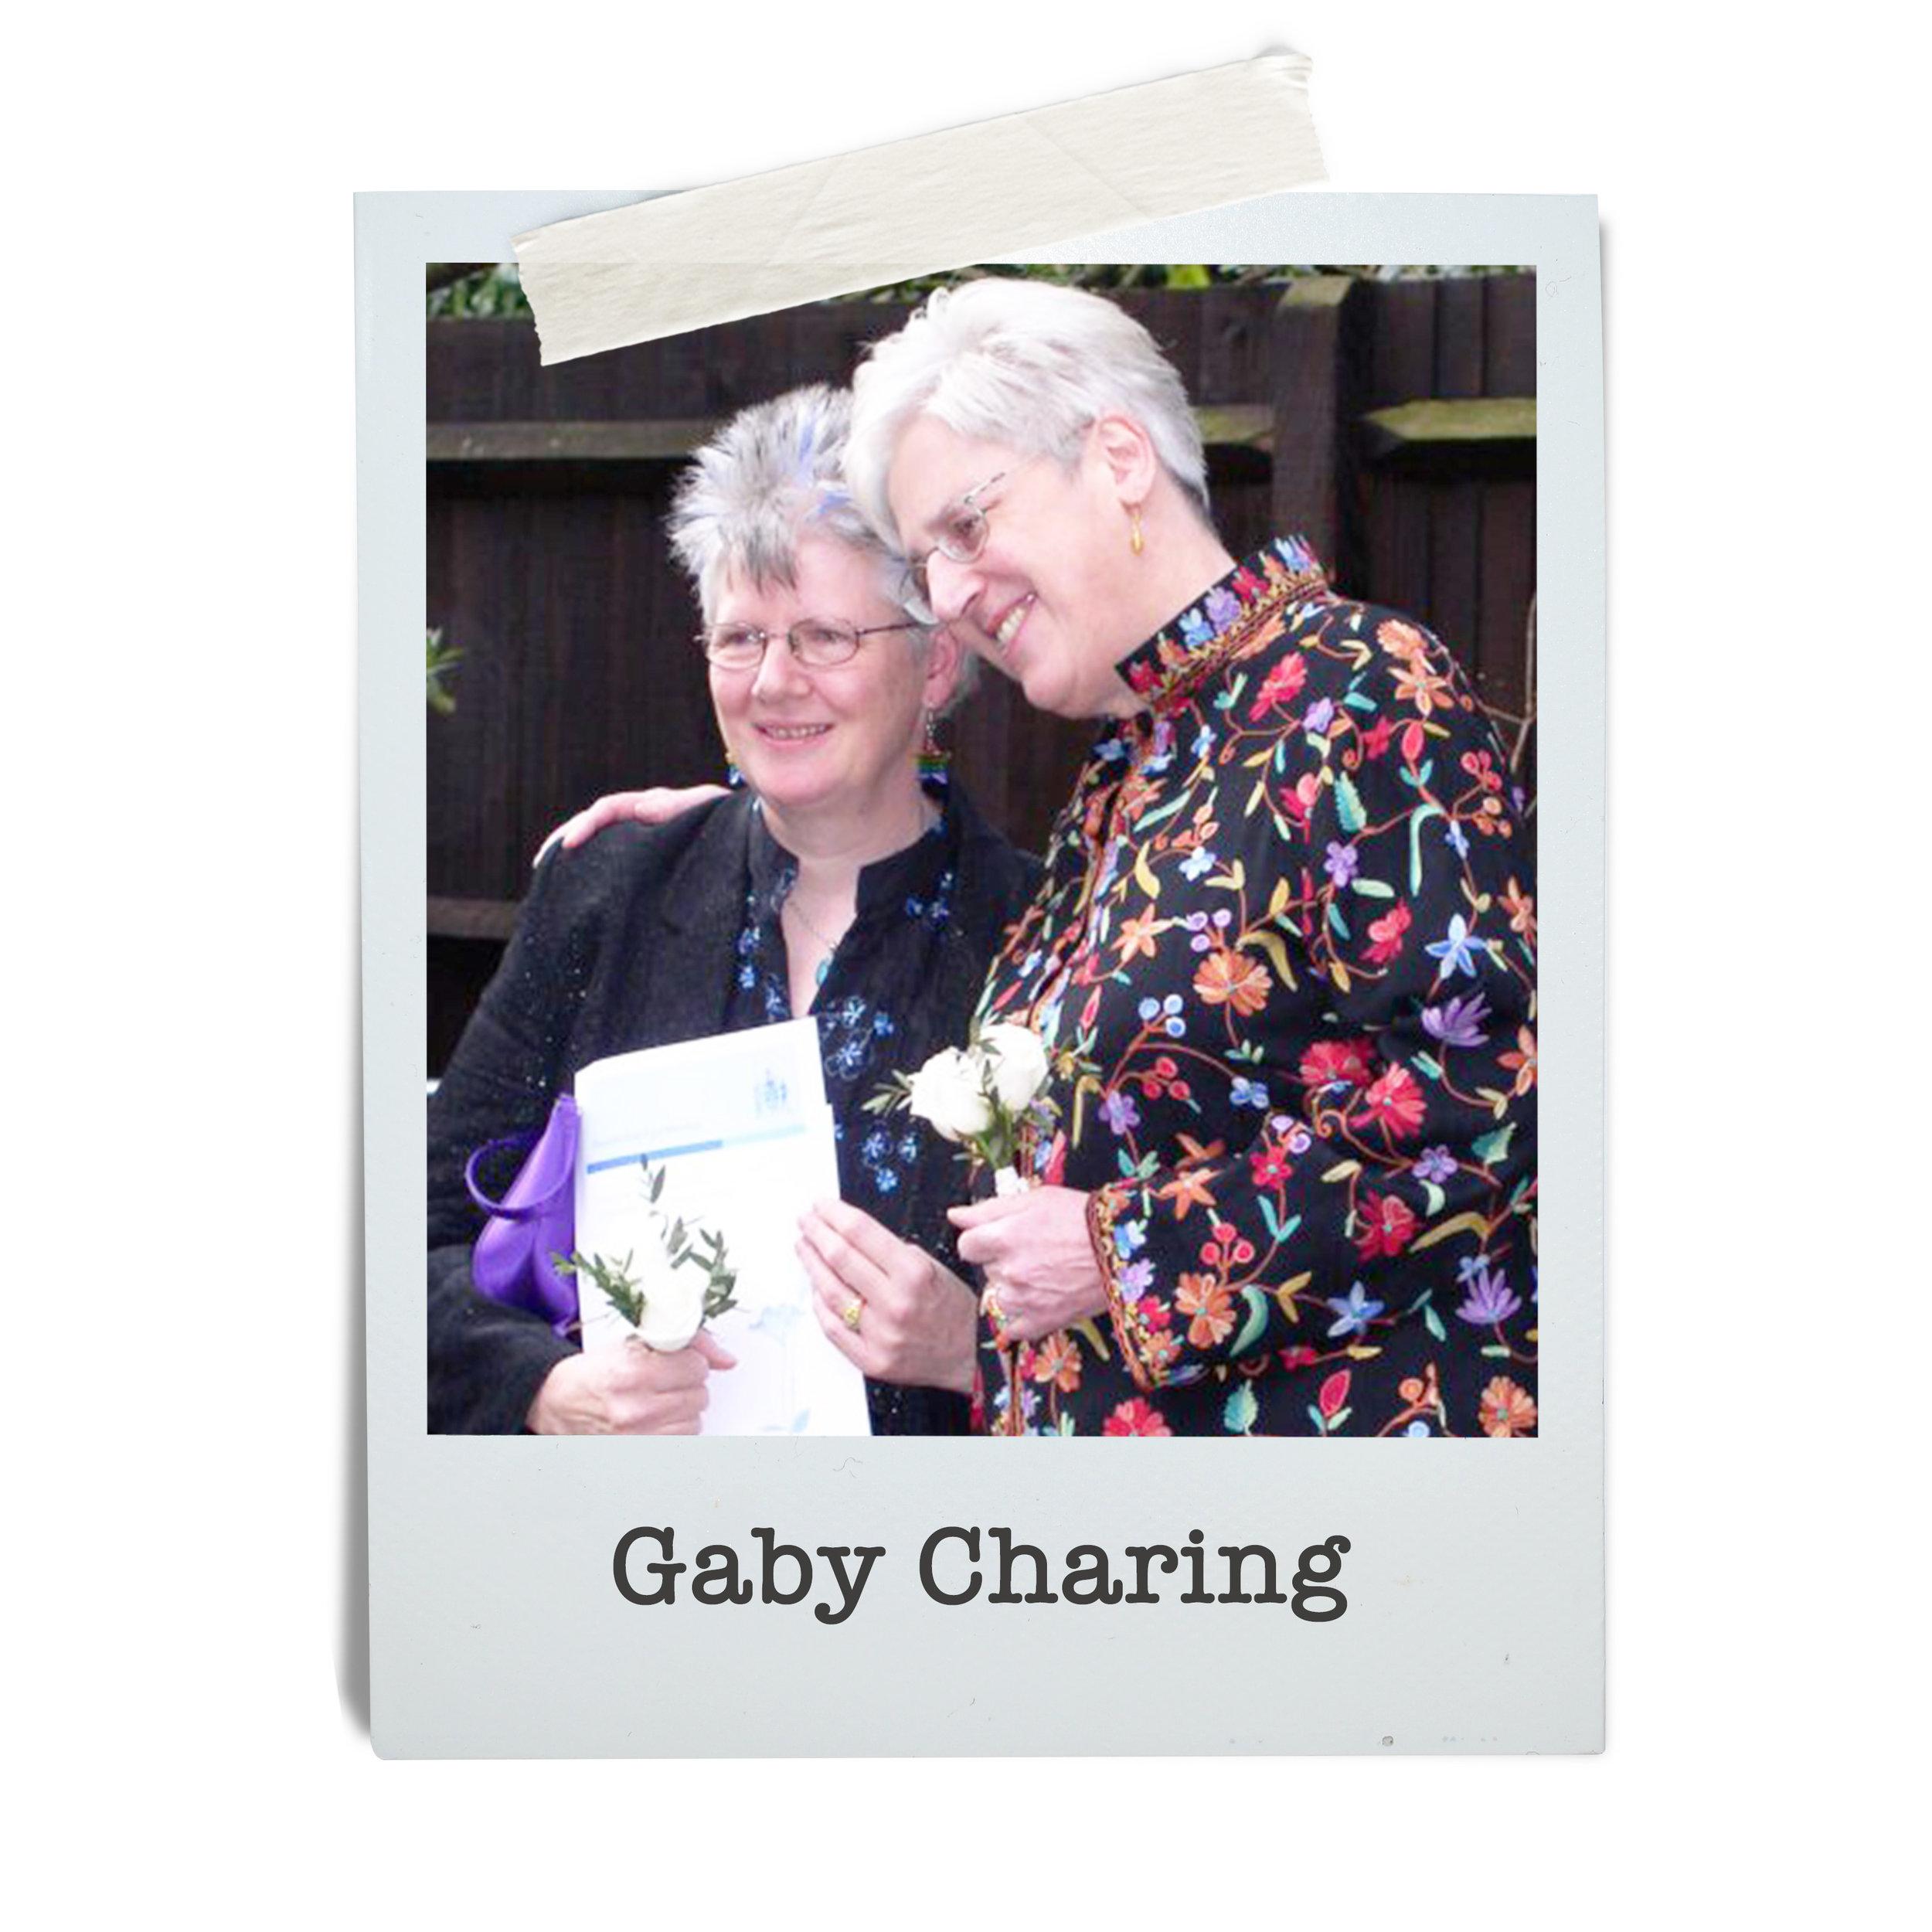 Gaby Charing